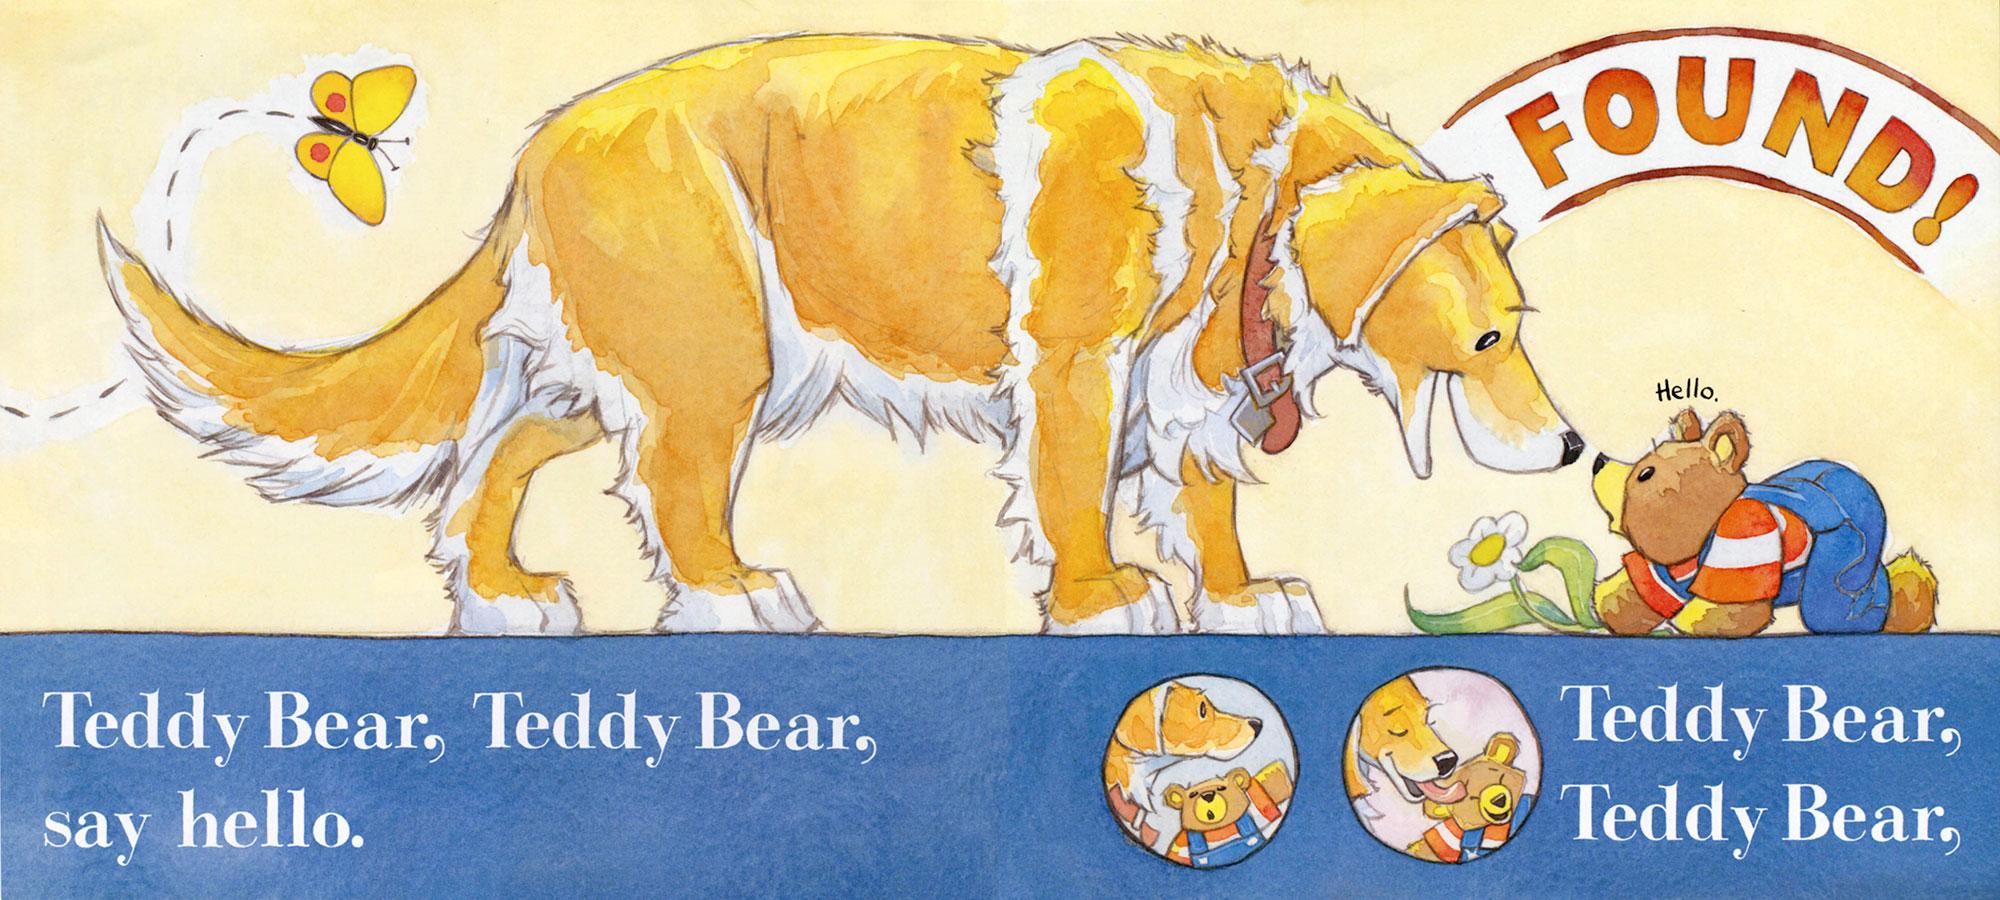 Teddy Bear, Teddy Bear  Greenwillow Books, 2005; public domain text